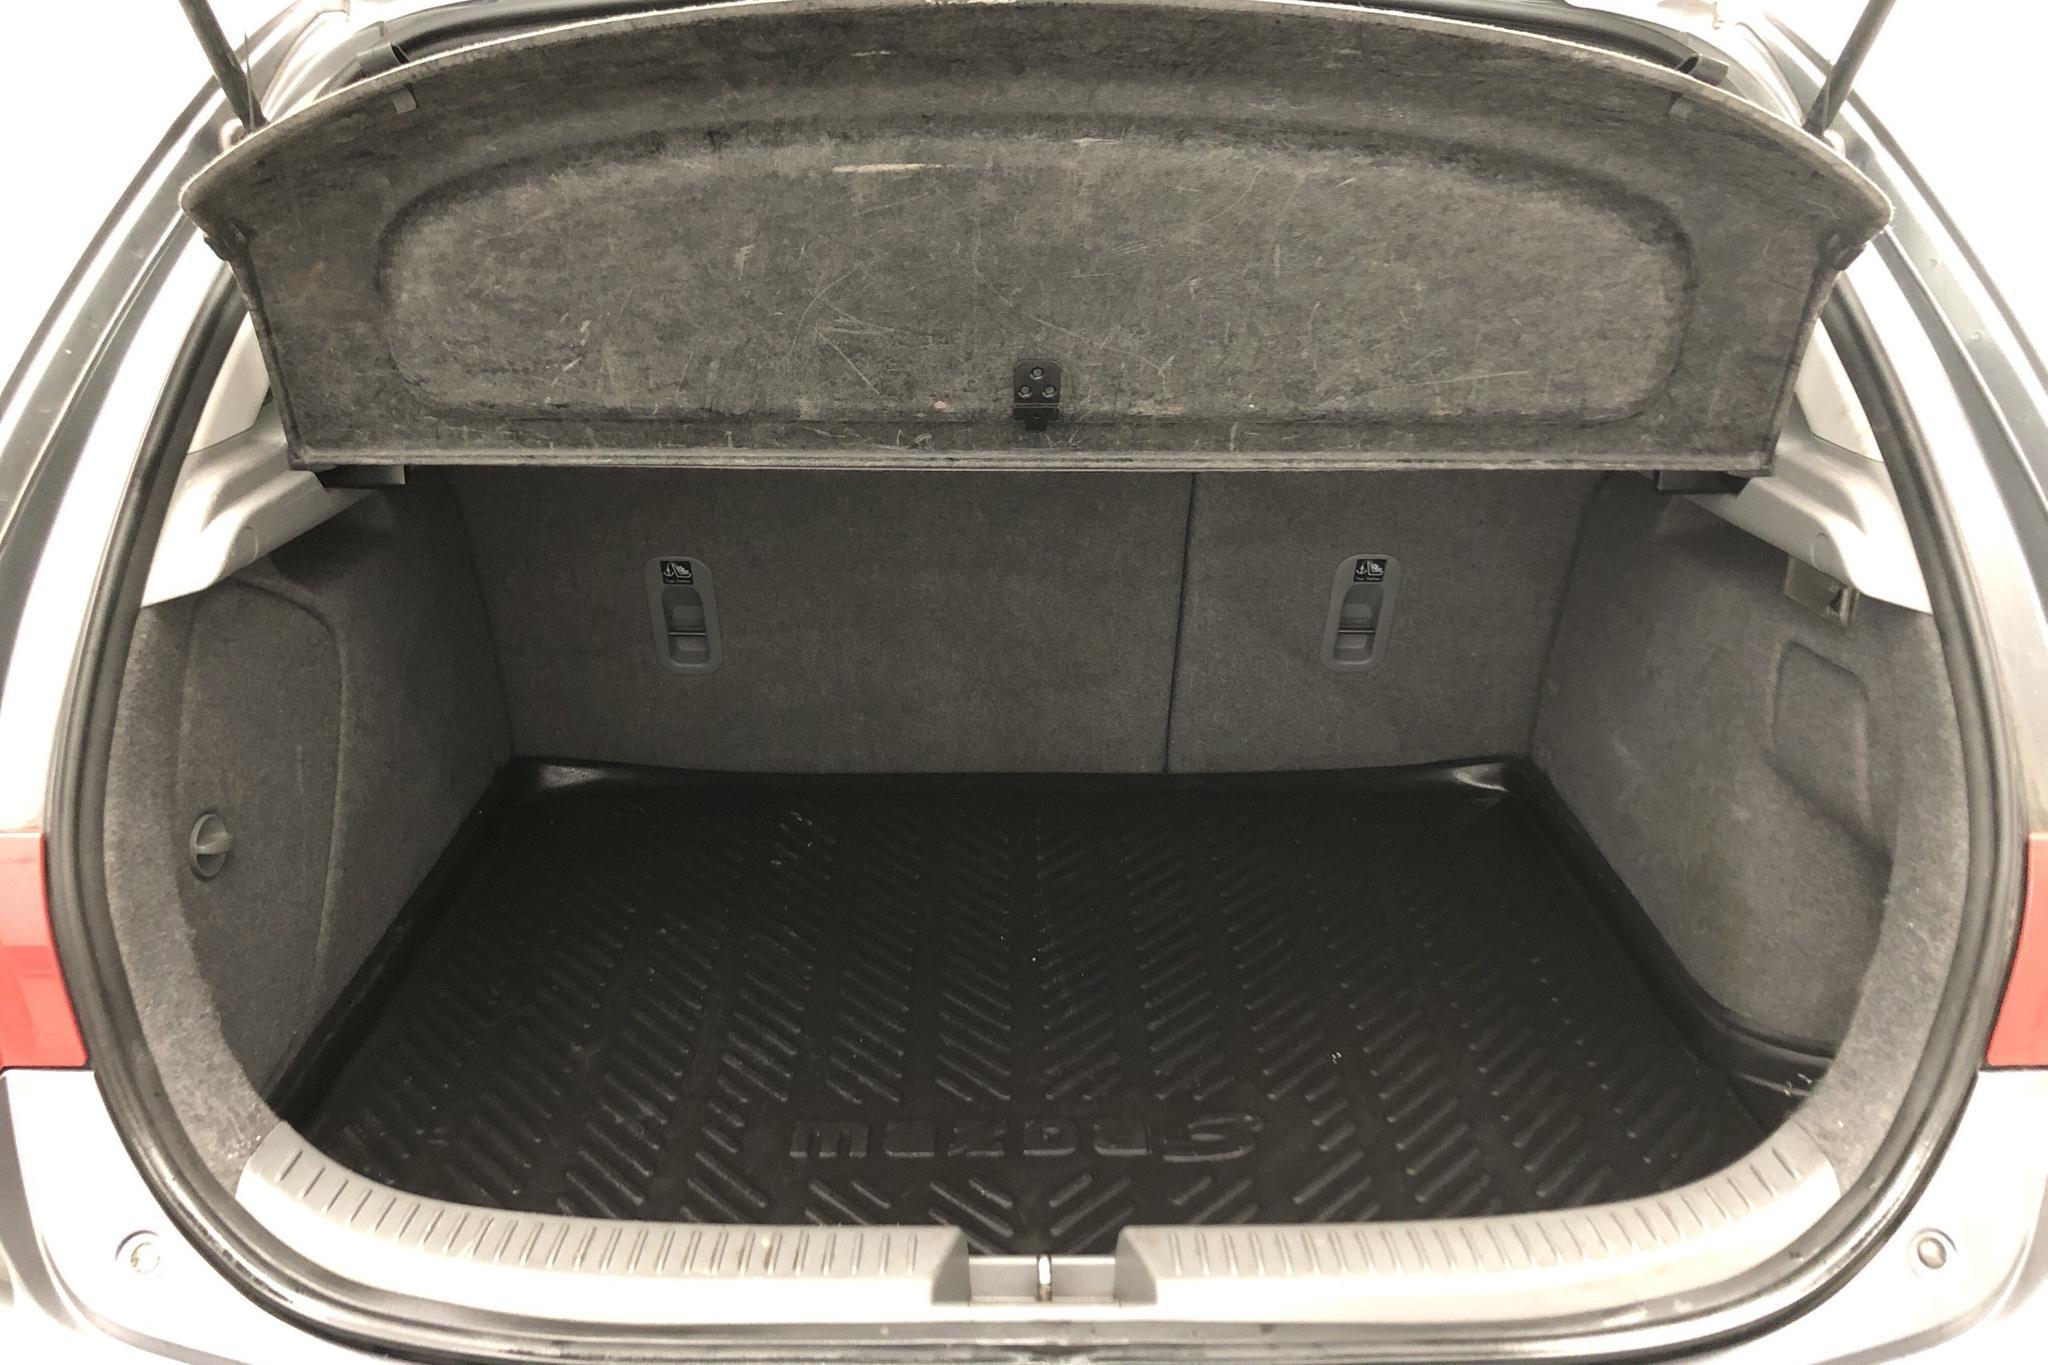 Mazda 3 1.6 5dr (105hk) - 9 583 mil - Manuell - grå - 2004